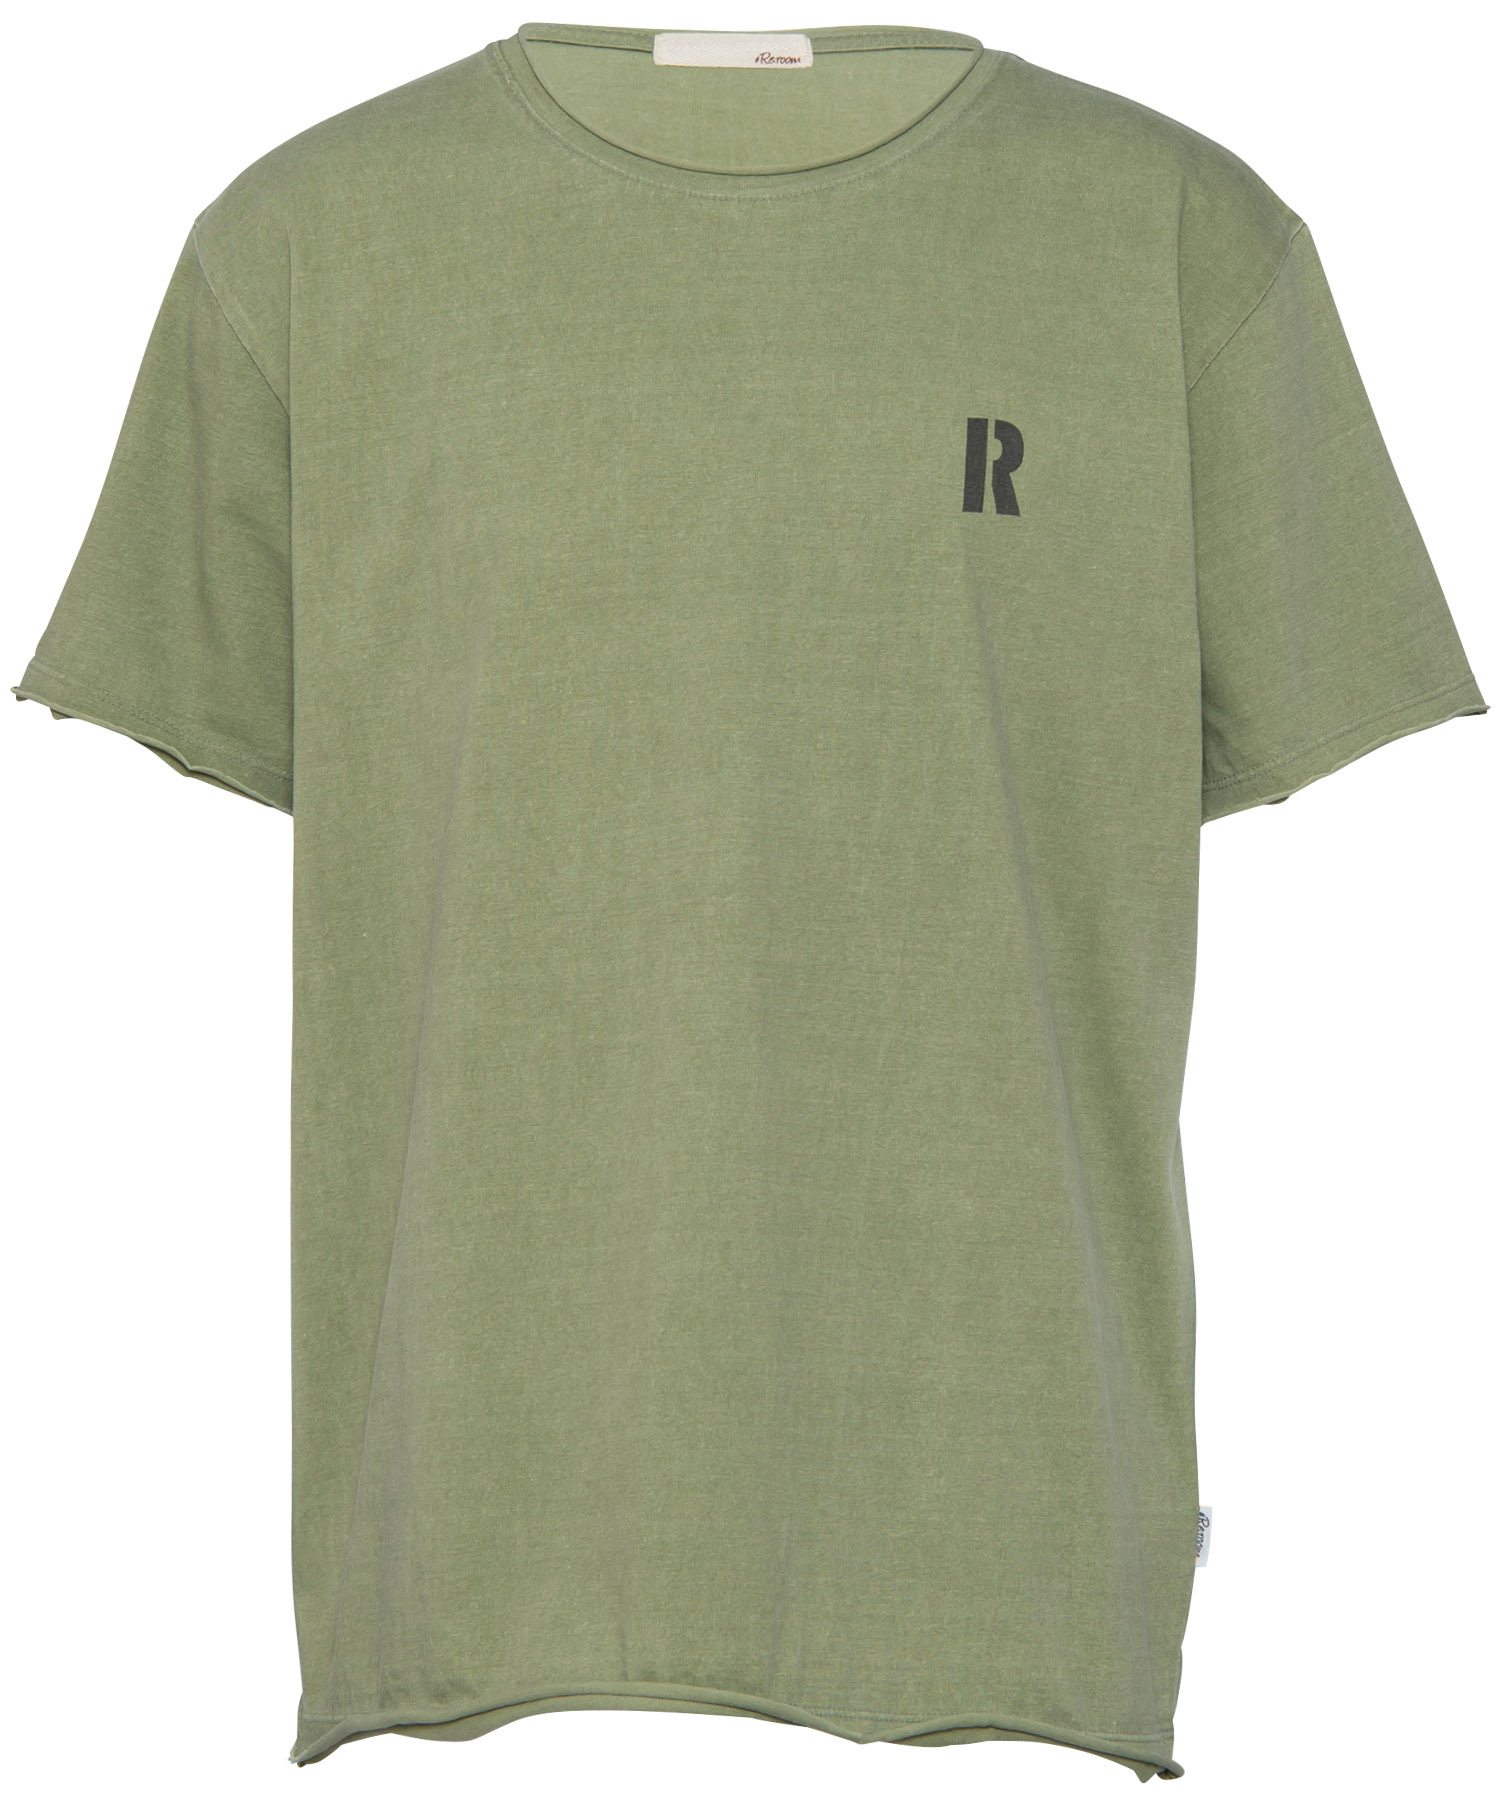 VINTAGE R ONE POINT BIG T-shirt[REC271]